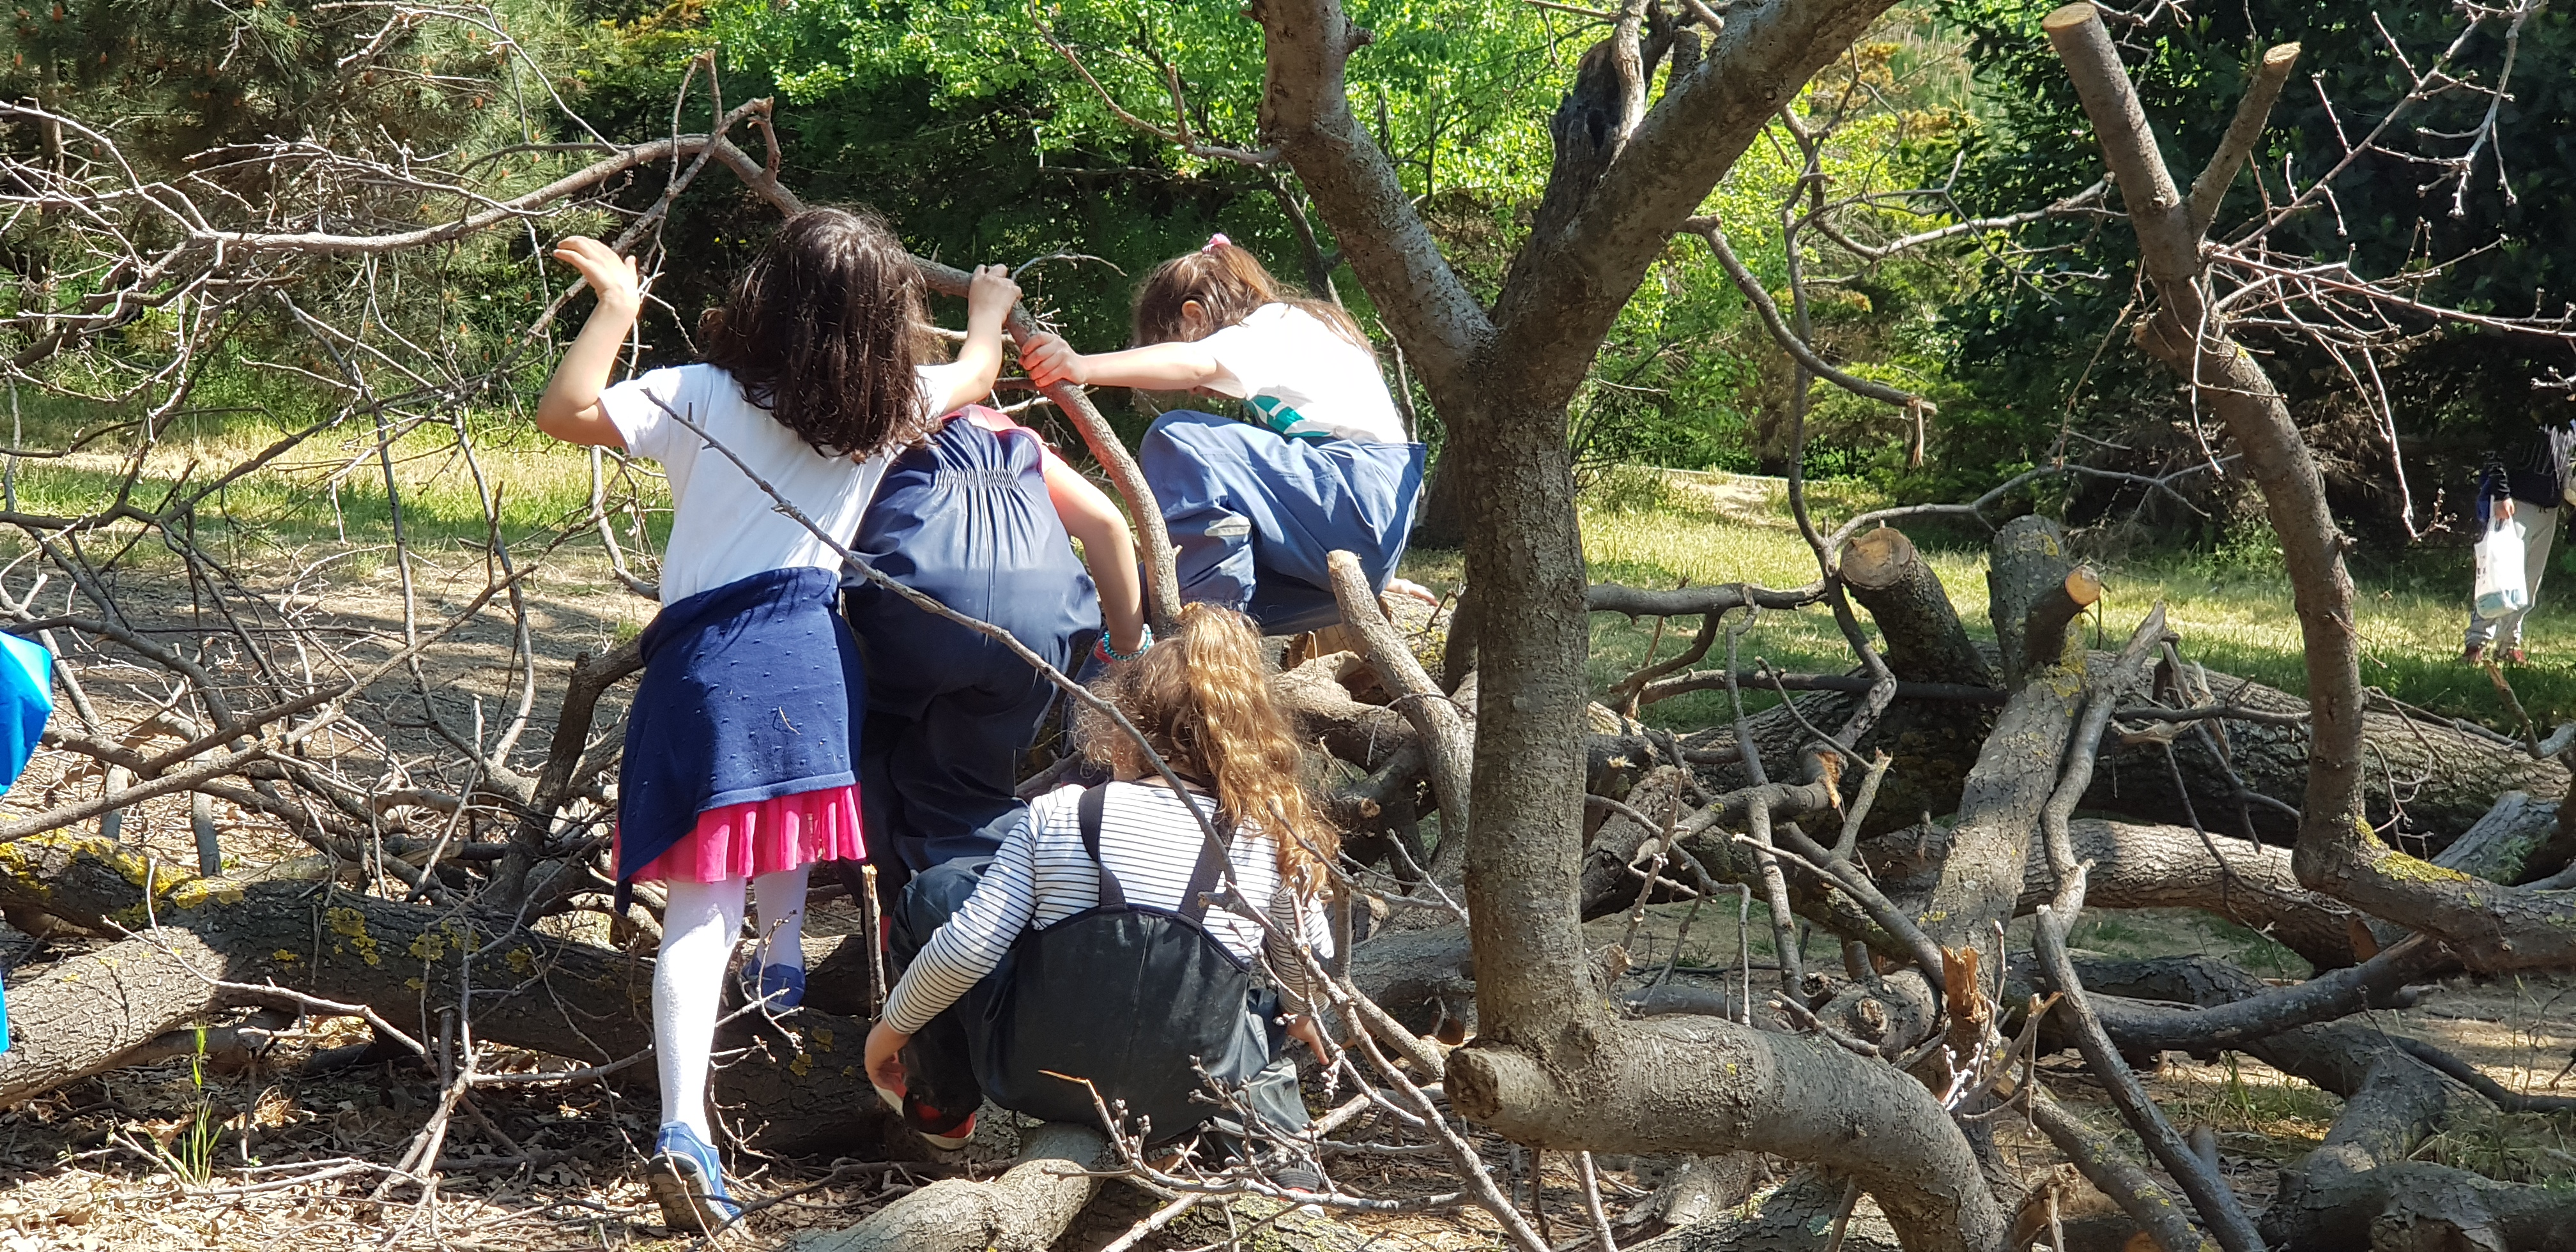 Oyuna dönüş, Doğaya dönüş, Doğala dönüş… - Küçük Orman Anaokulu